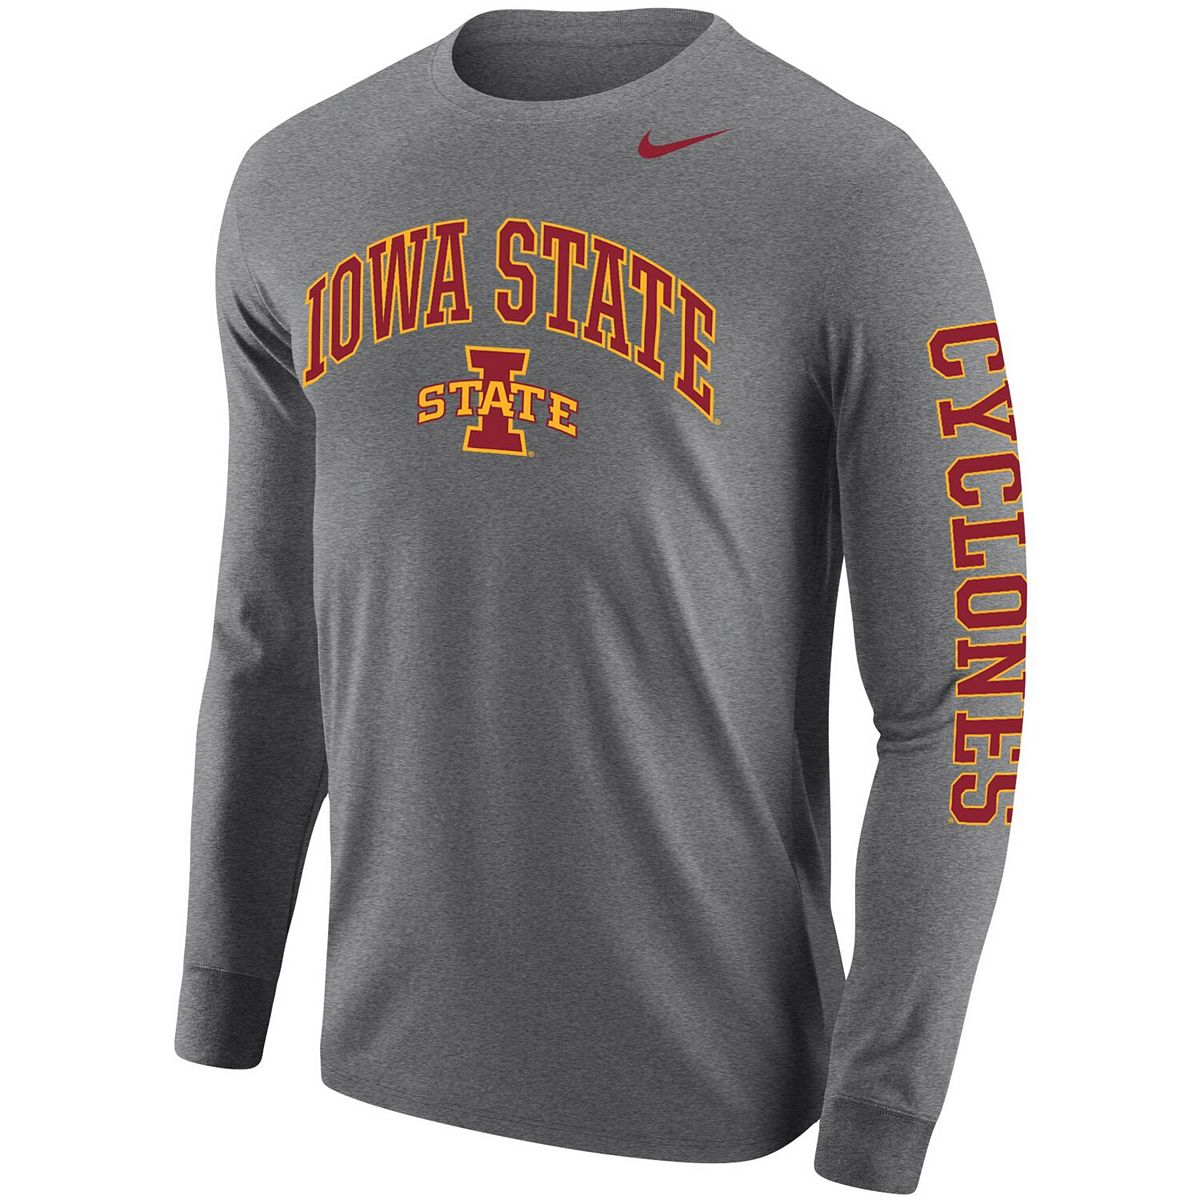 Men's Nike Heathered Gray Iowa State Cyclones Arch & Logo Two-Hit Long Sleeve T-Shirt J3ar1